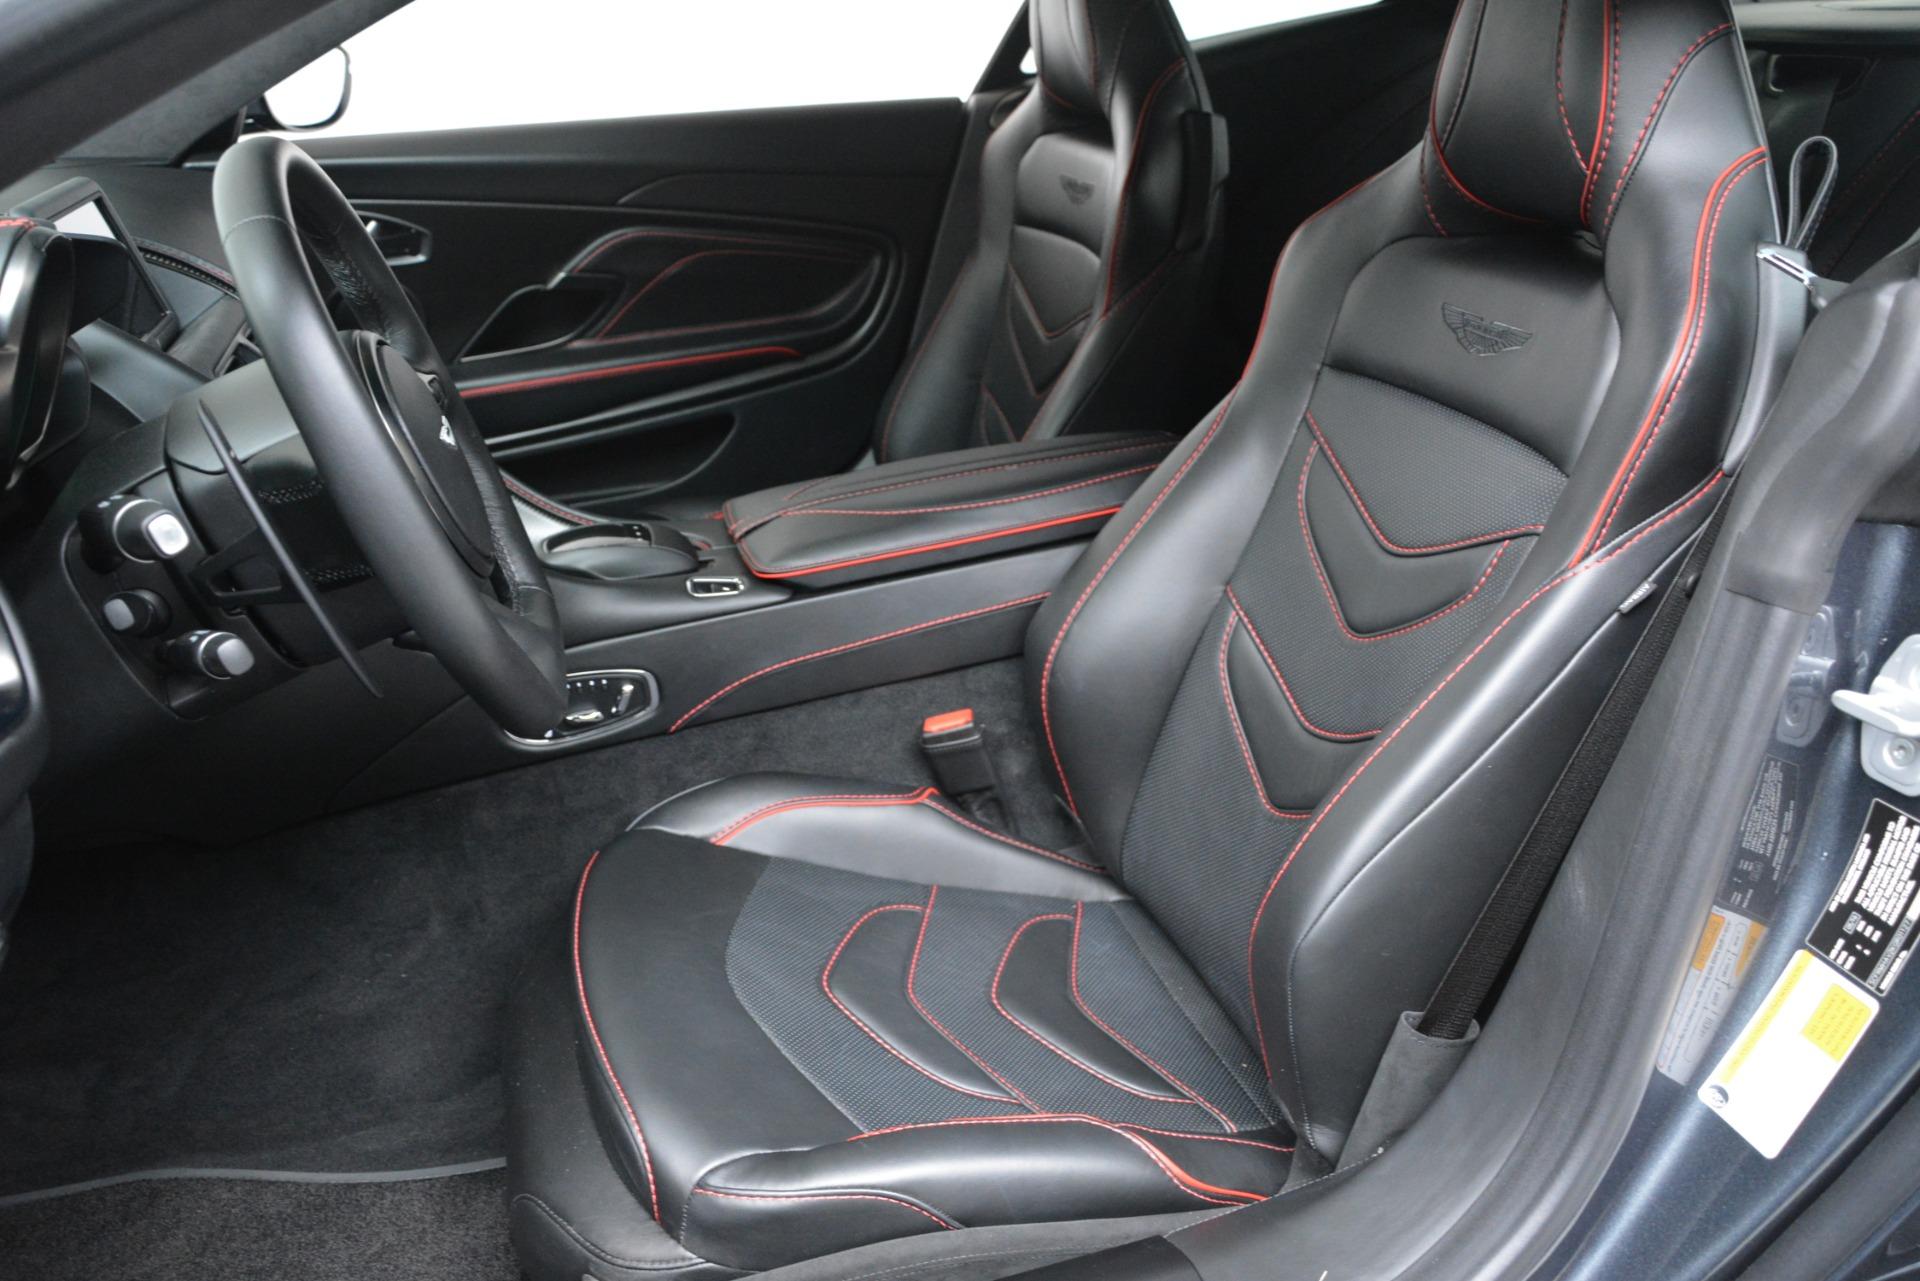 New 2019 Aston Martin DBS Superleggera For Sale 354221 In Greenwich, CT